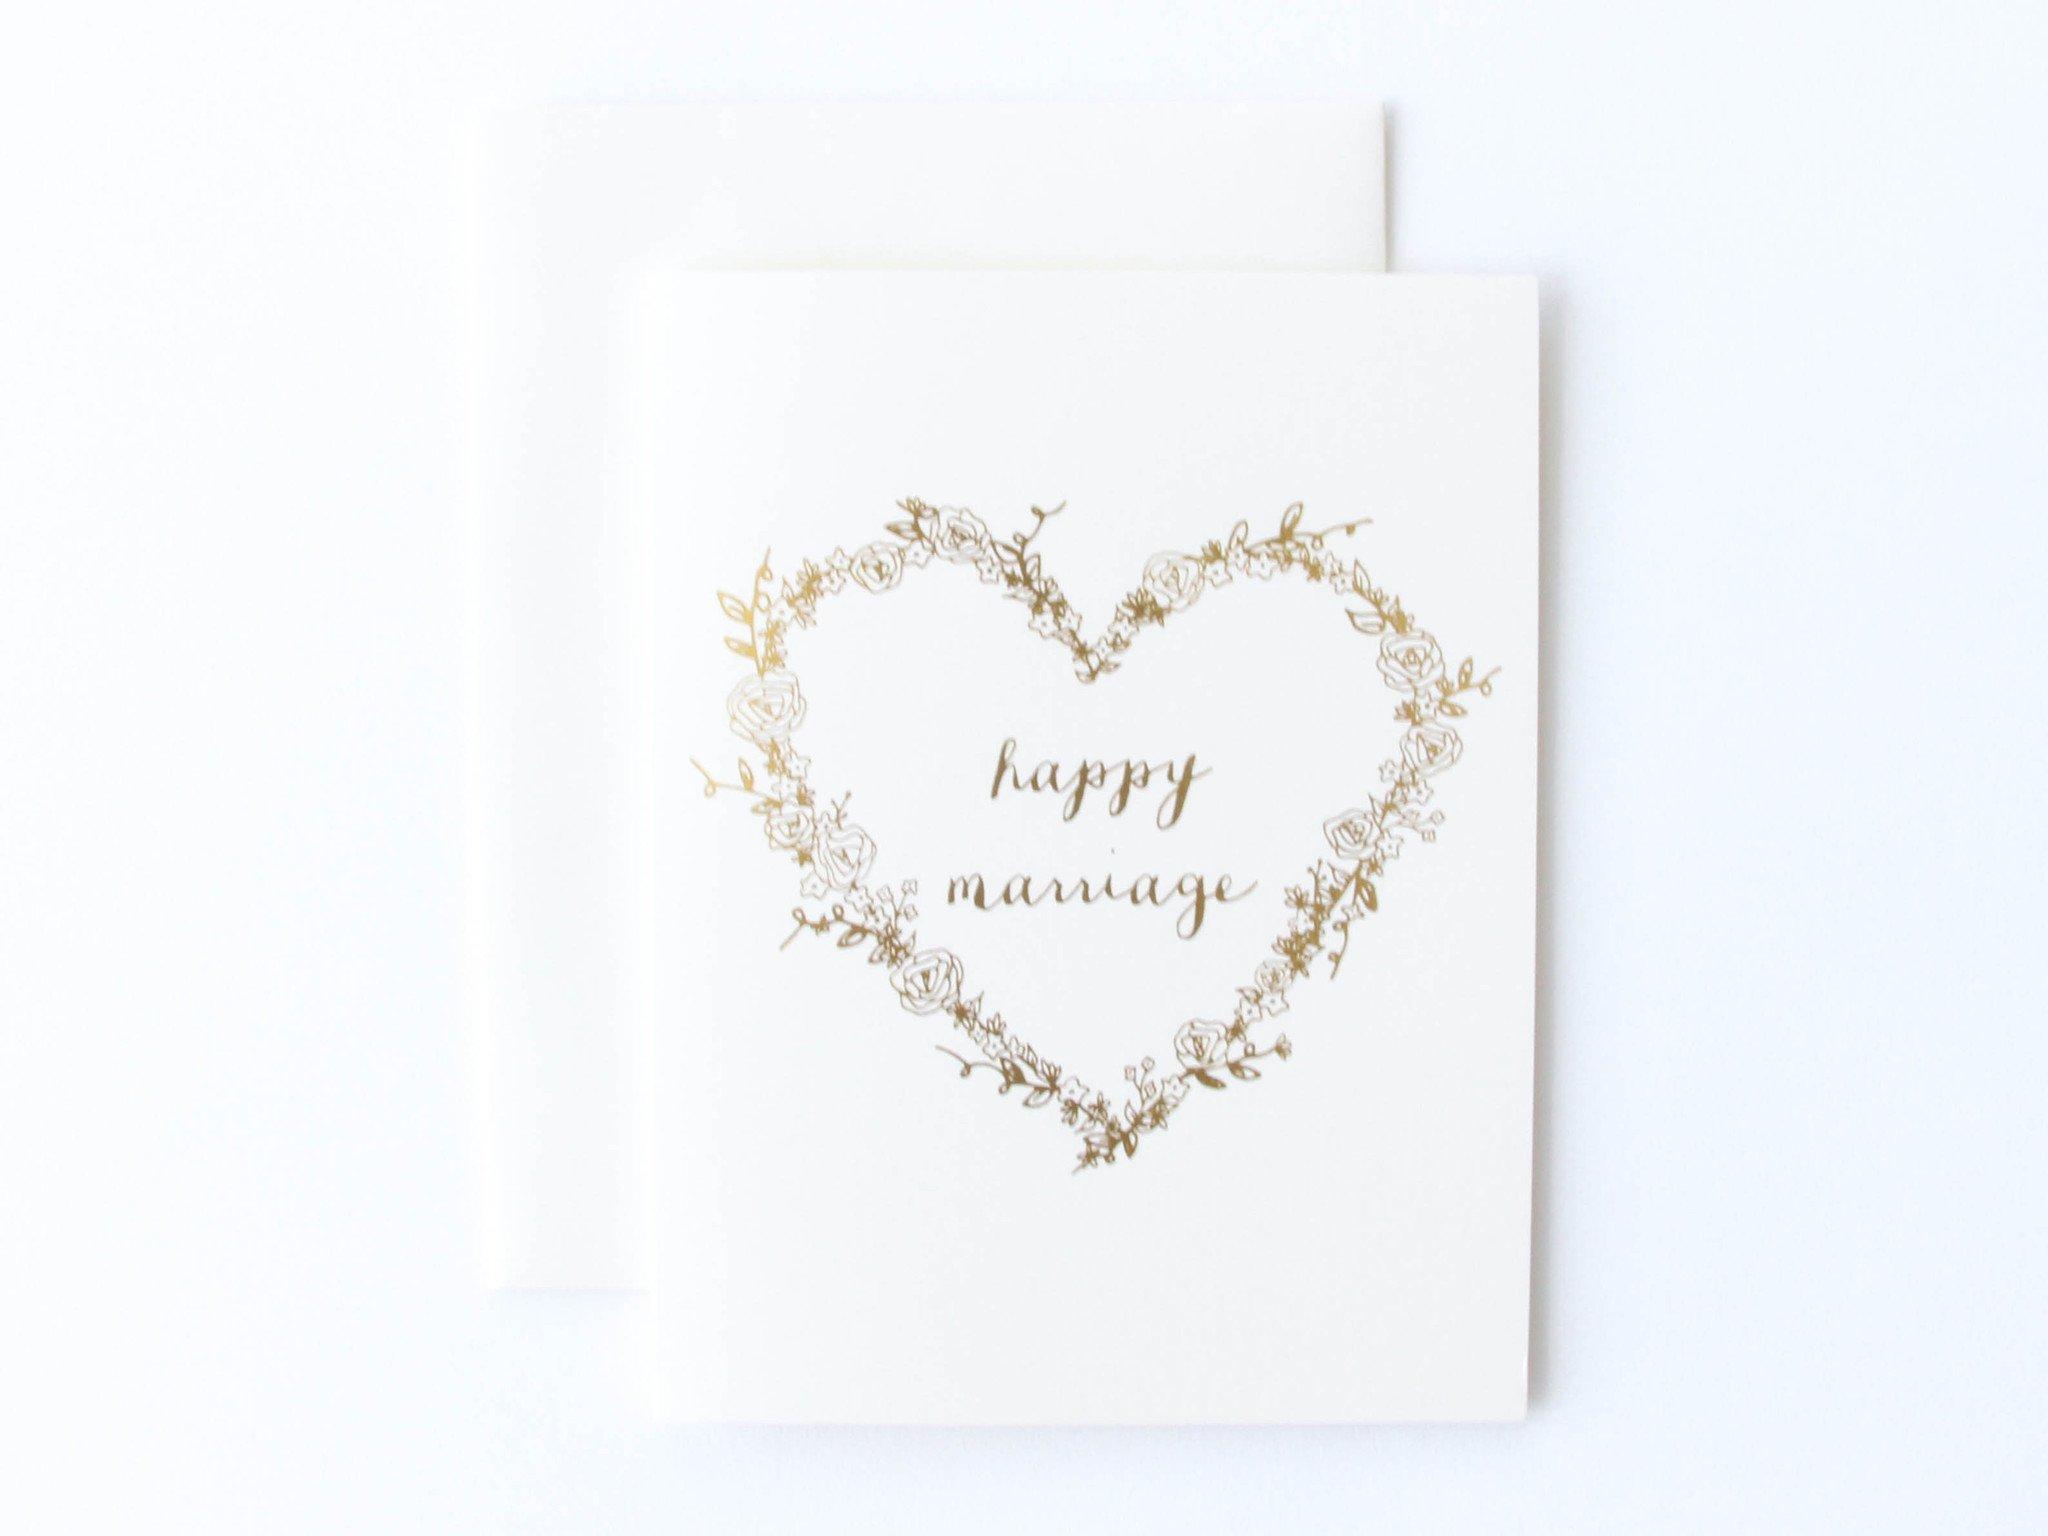 Happy mariage card photo